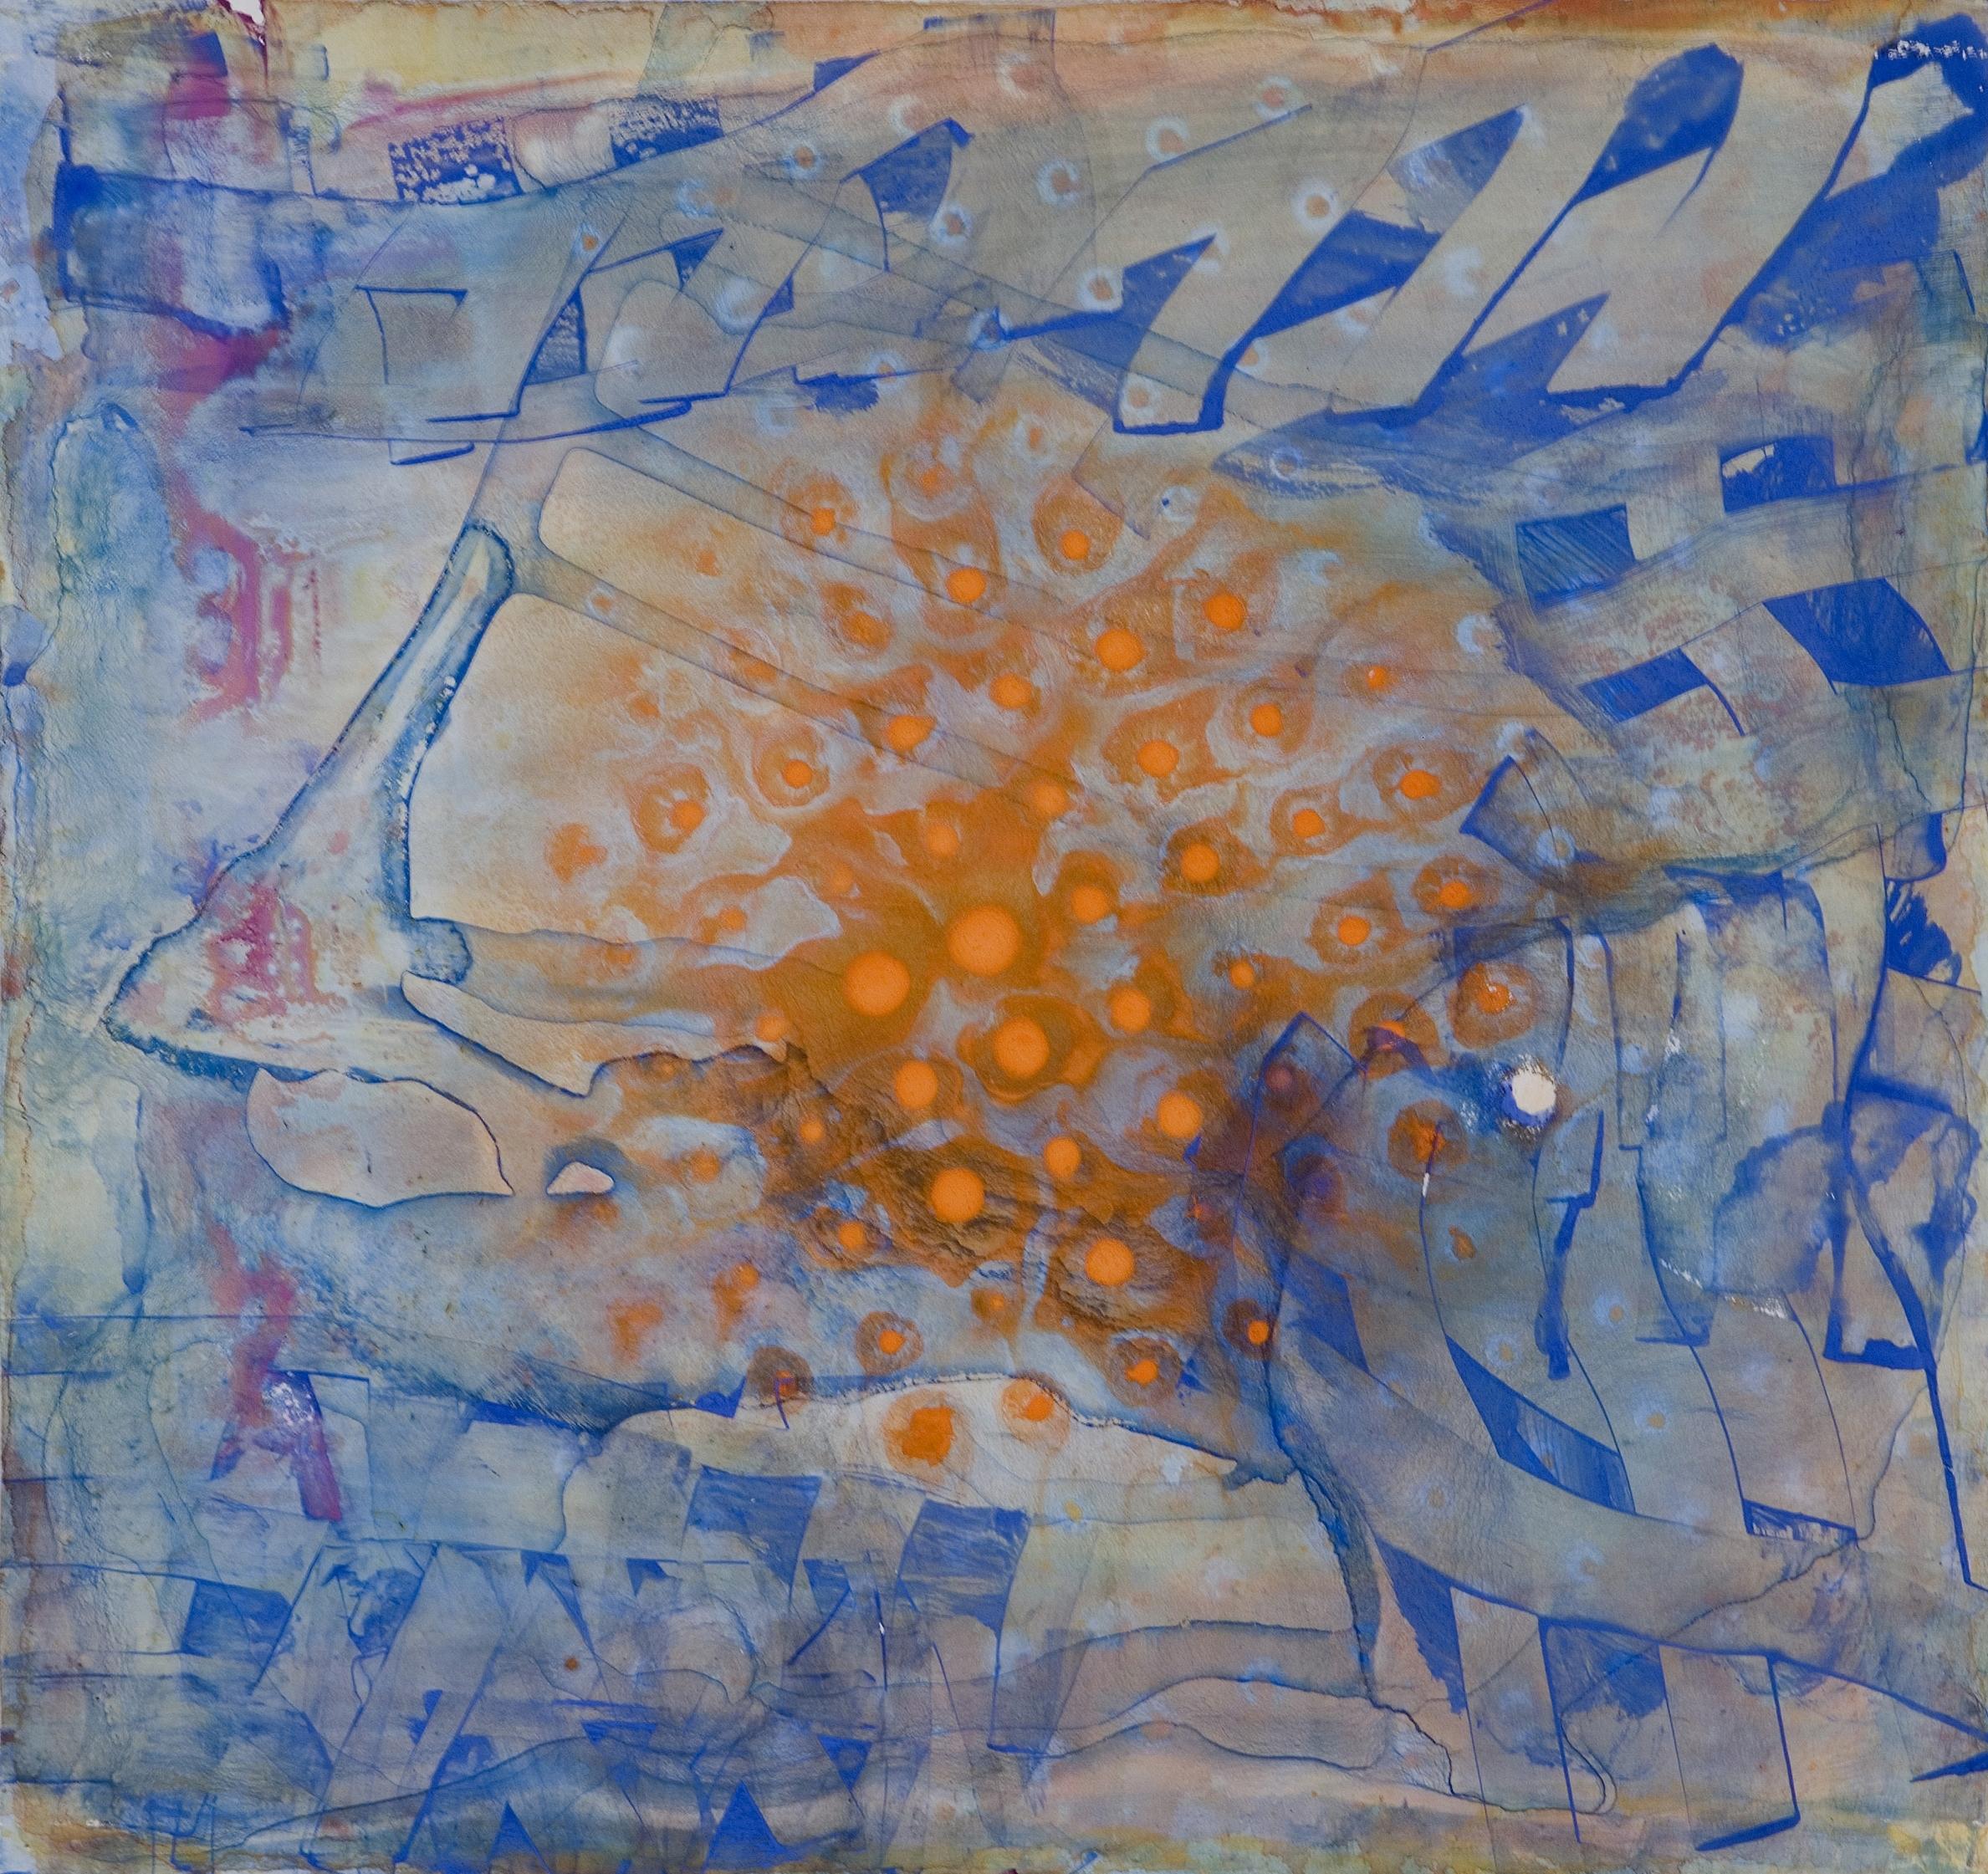 "Sanskriti Series #7, watercolor and casein, 12"" x 13"", 2006"